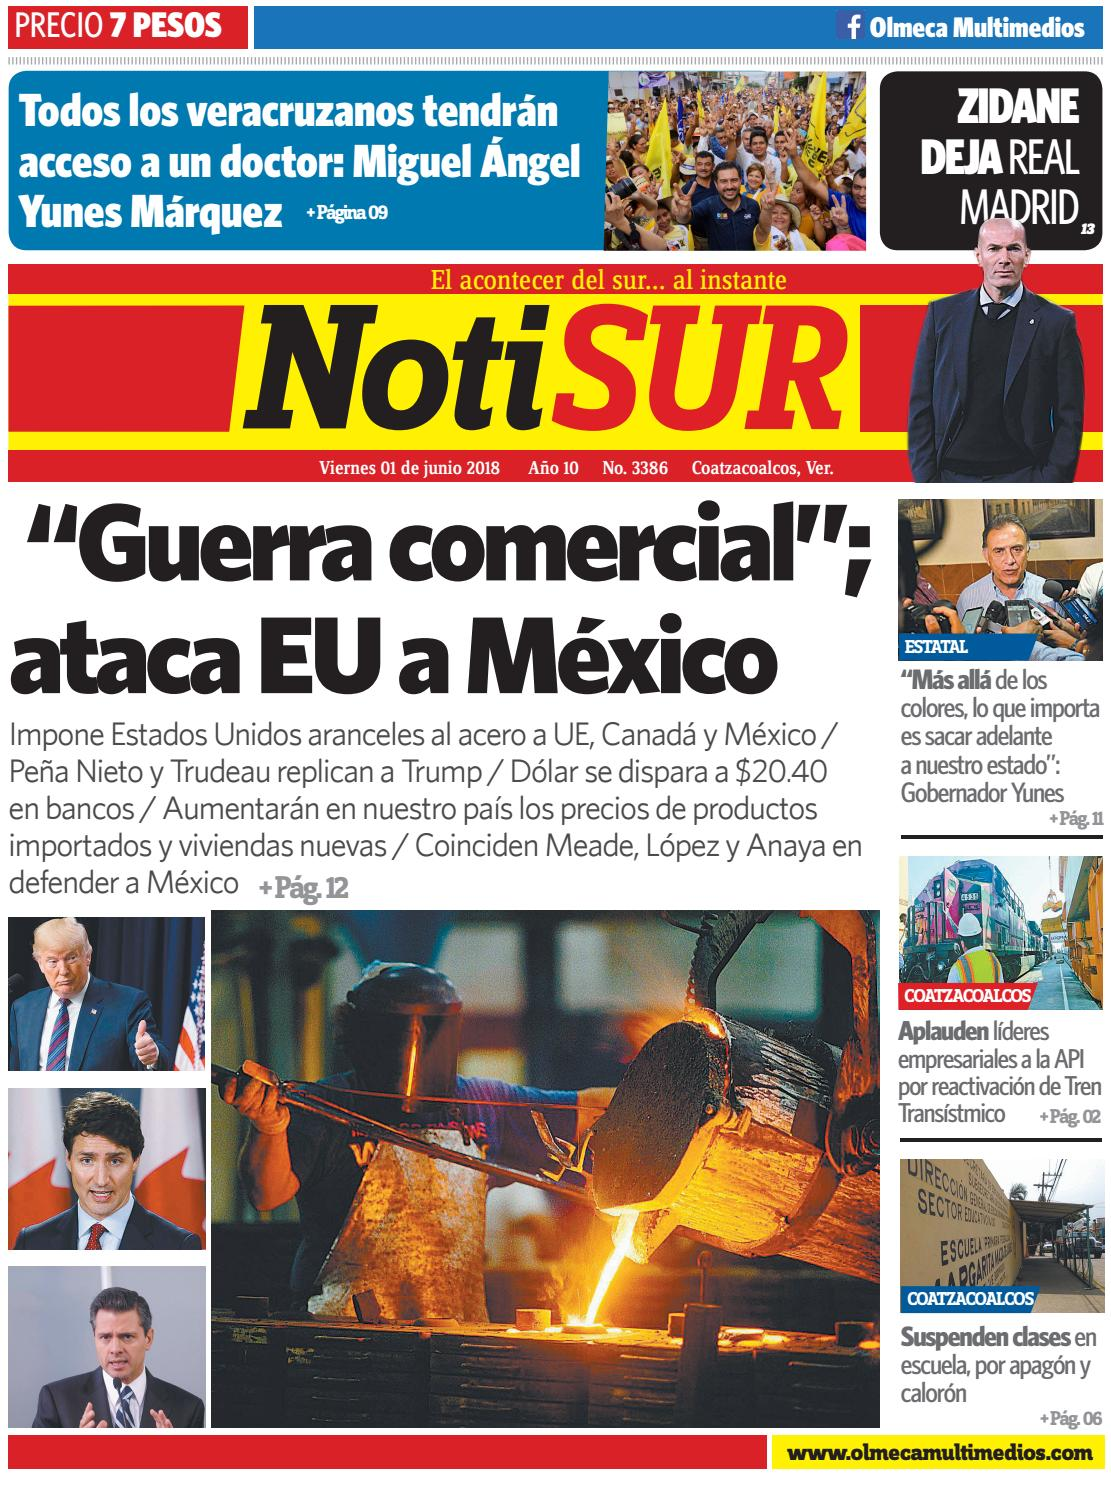 NotiSUR 01 de Junio 2018 by Diario NotiSUR Coatzacoalcos 2015, 2016 ...